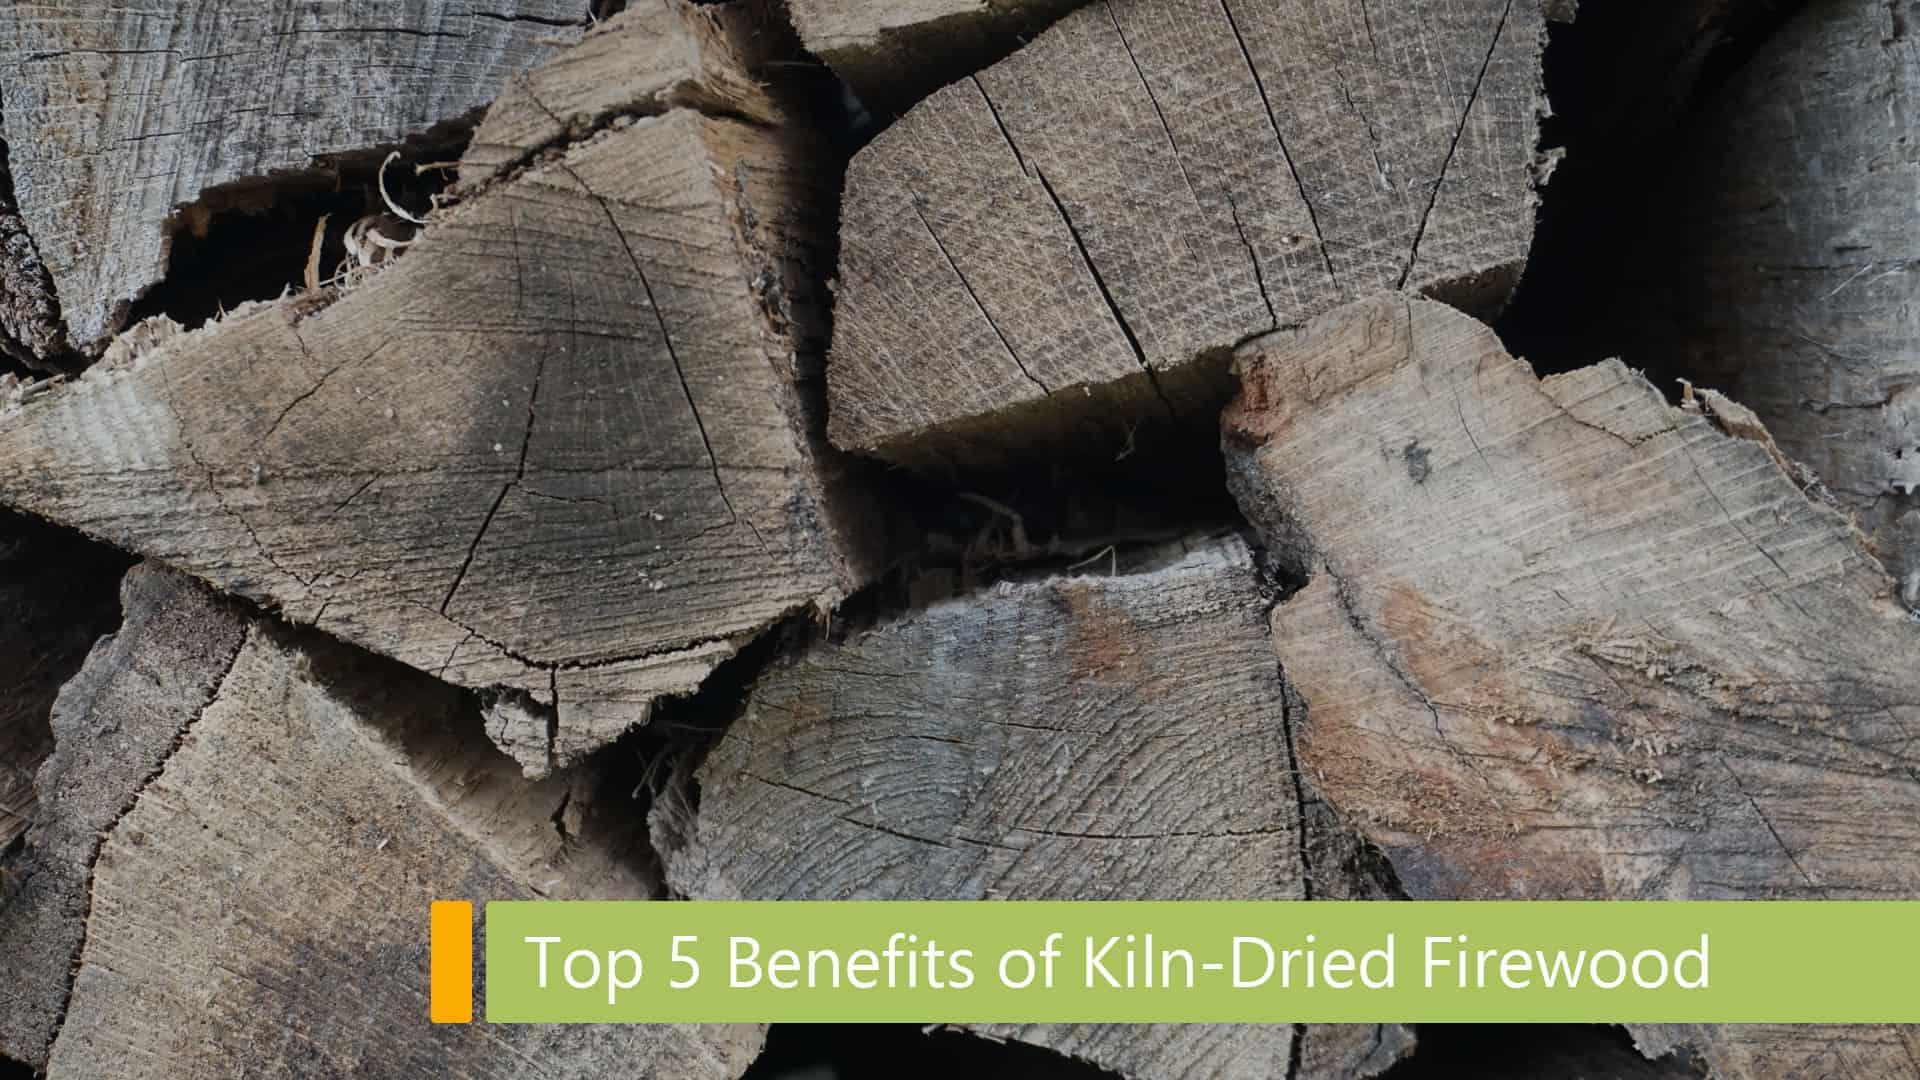 benefits of kiln dried firewood main image